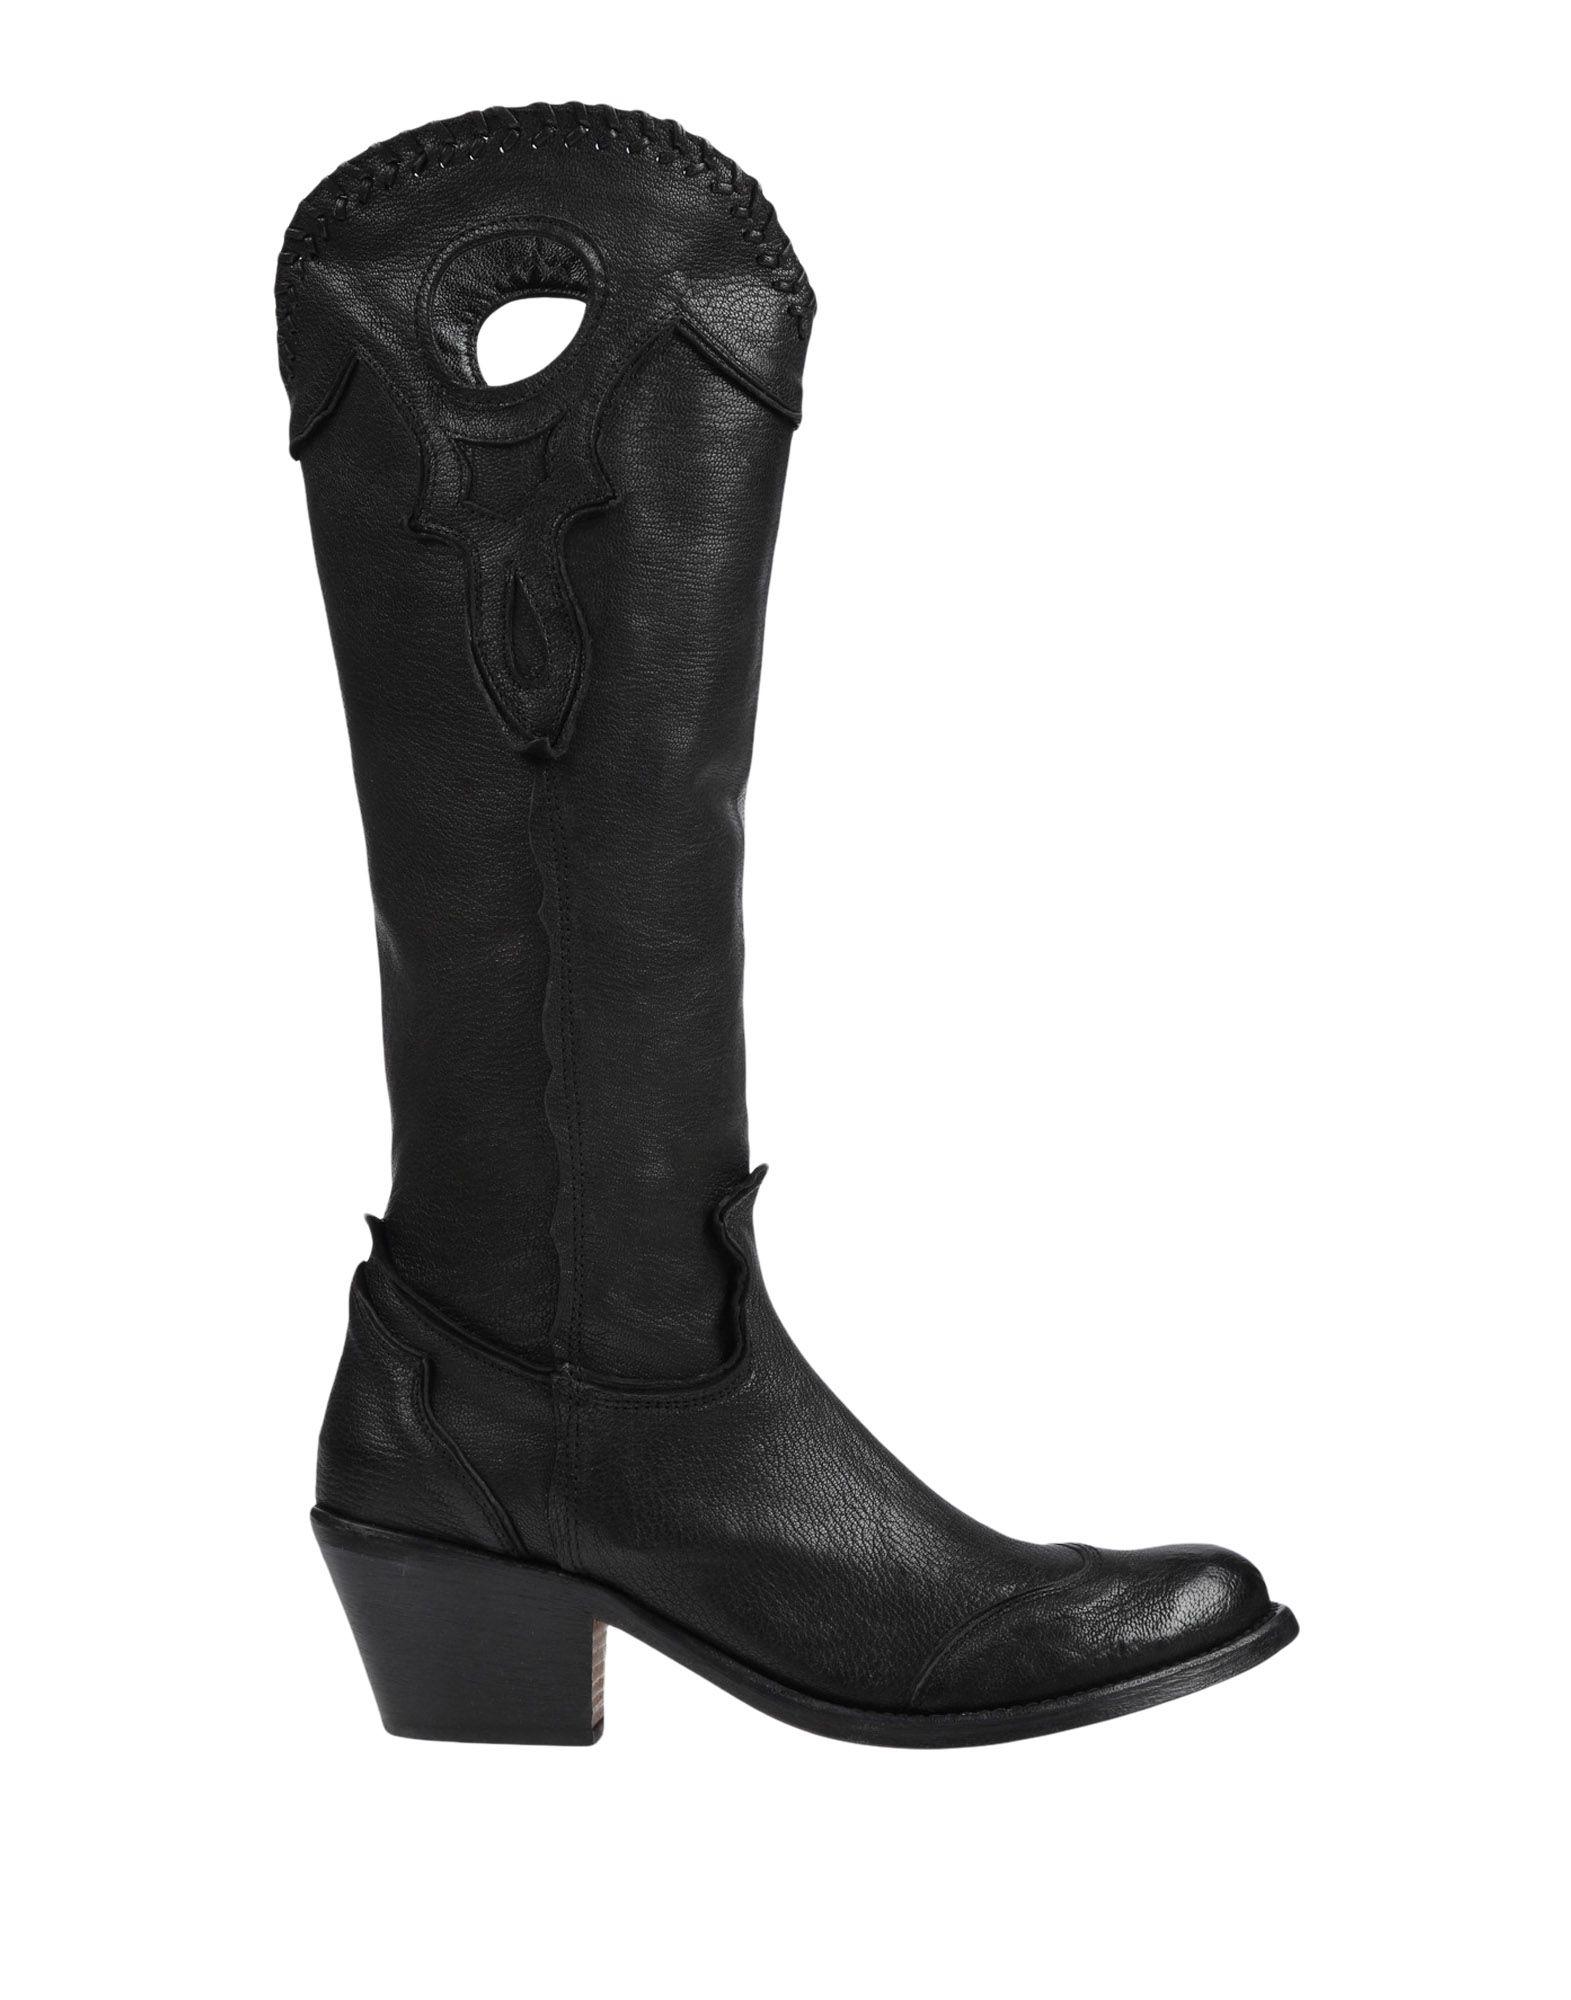 Lena Milos Stiefel 11529352EE Damen  11529352EE Stiefel Beliebte Schuhe 62f8f9